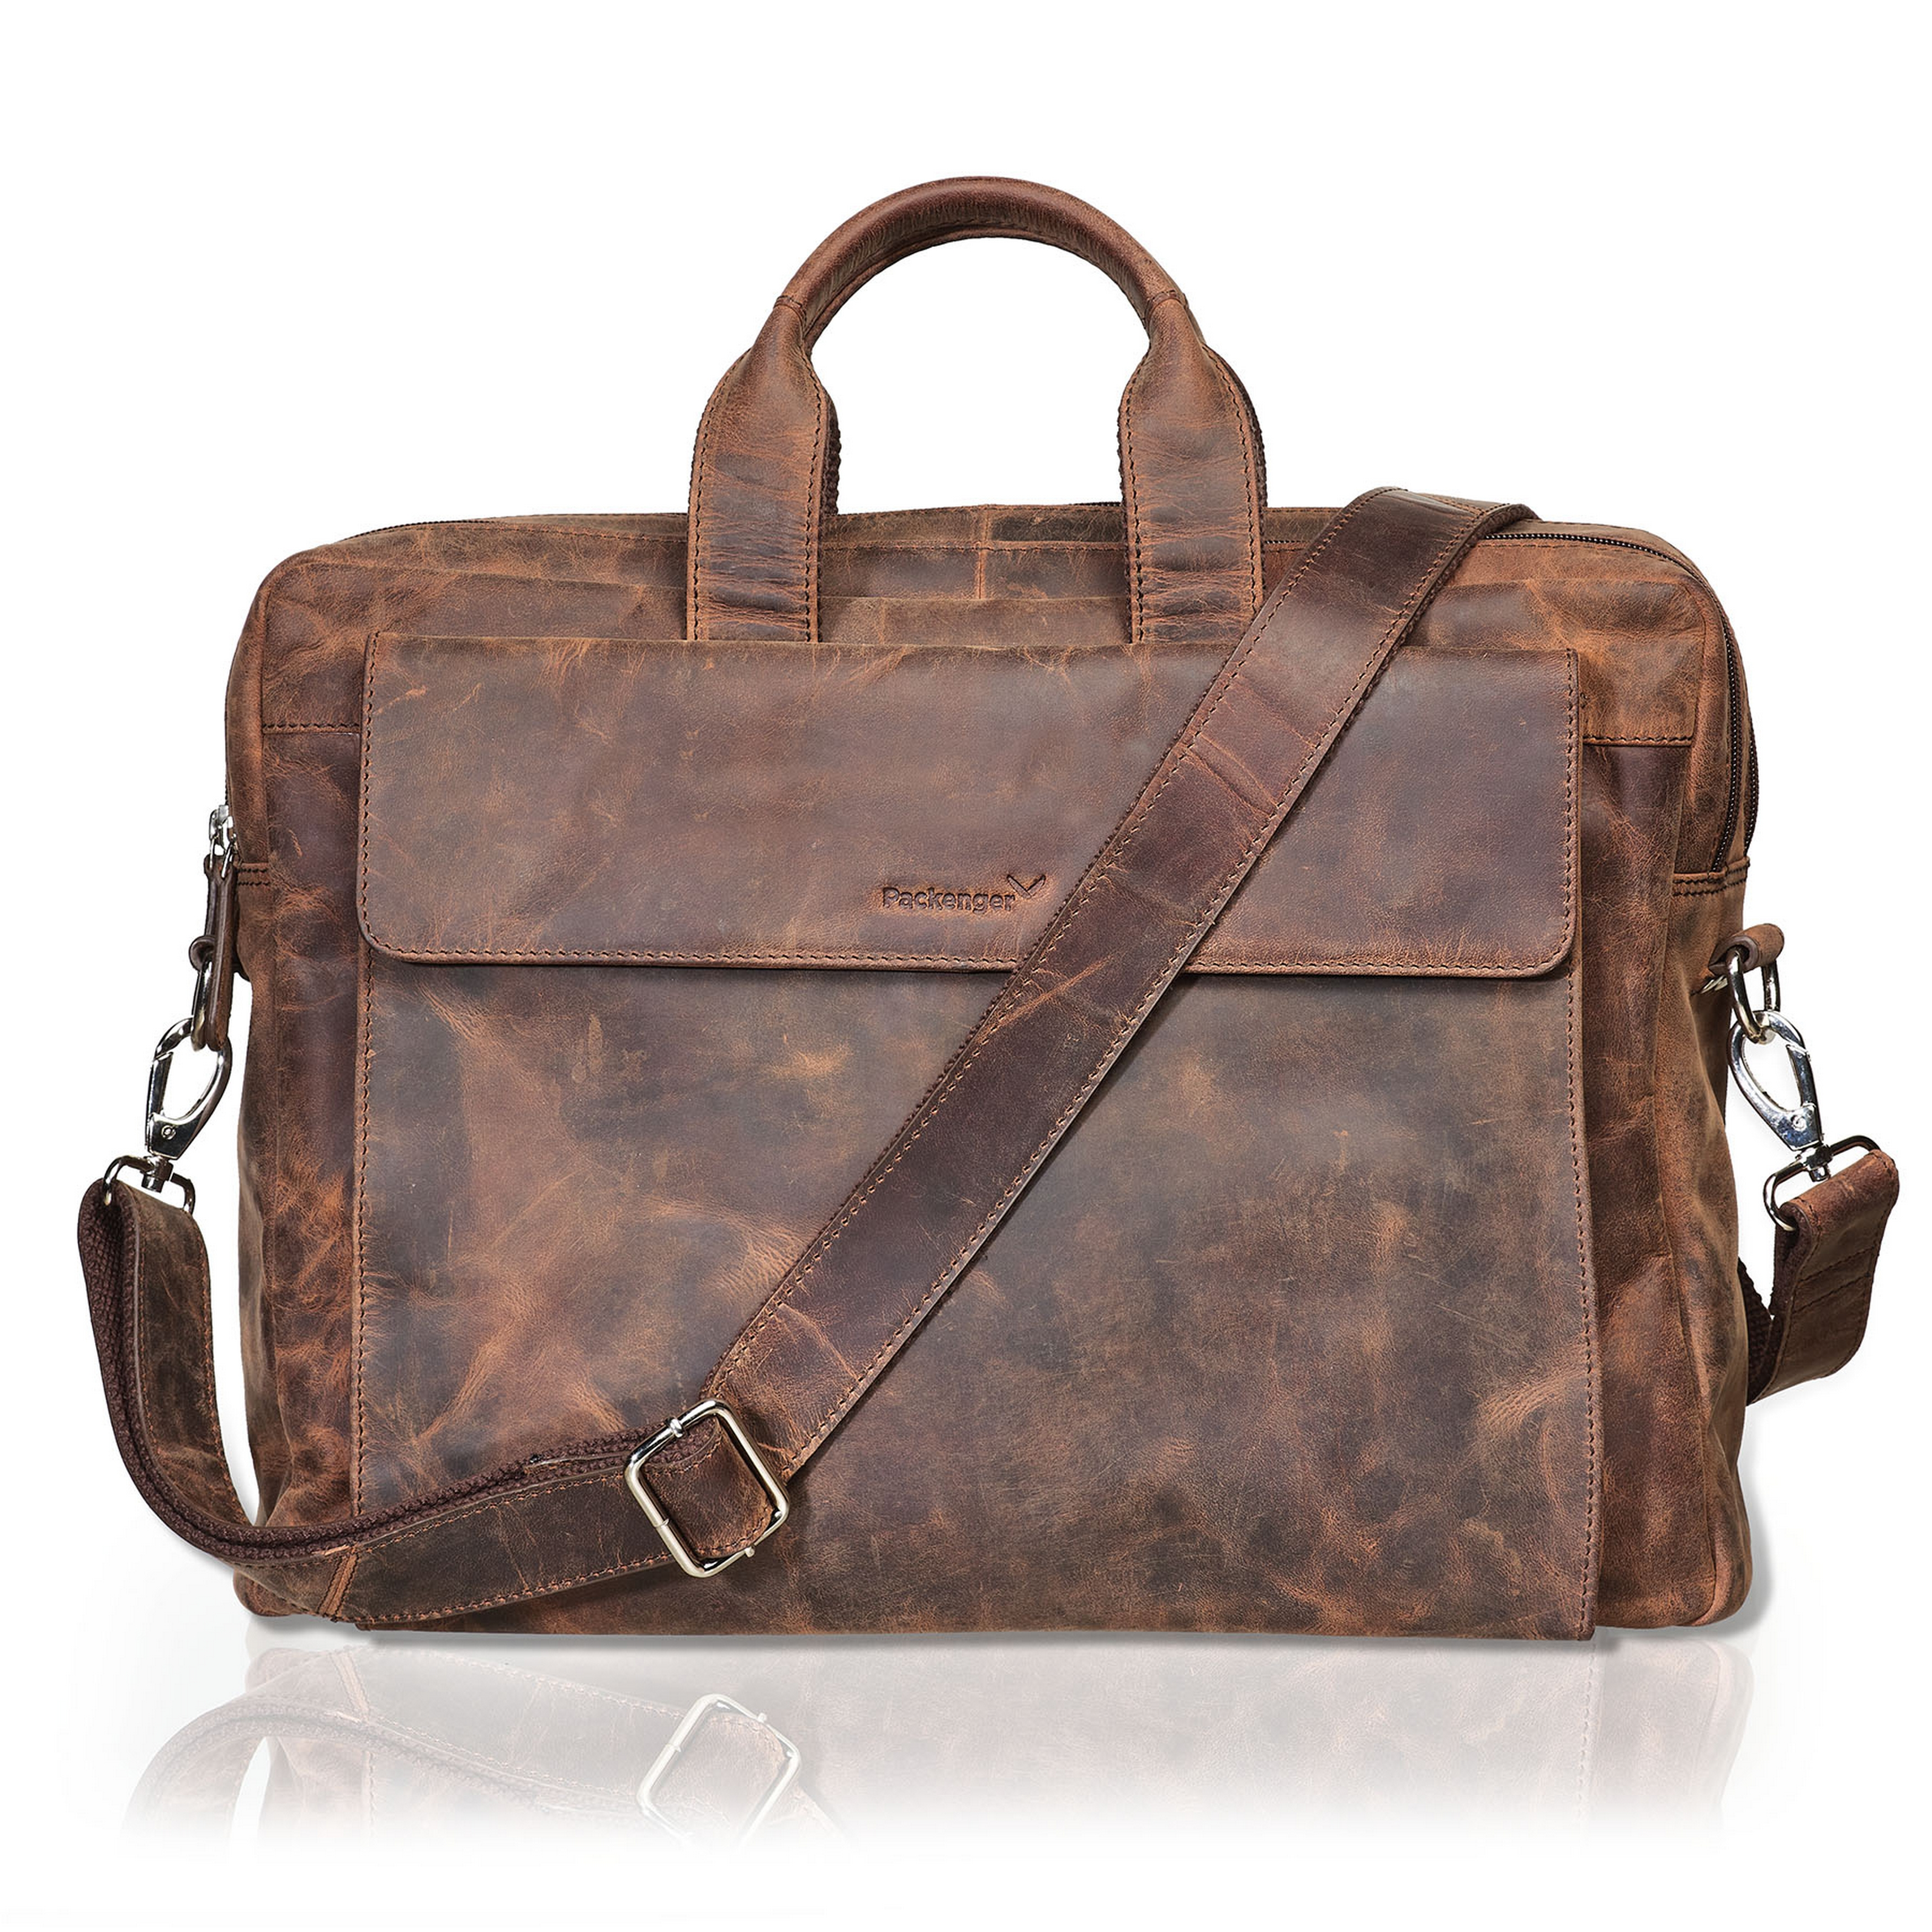 Packenger Messenger Bag ODIN Ledertasche in Vintage Braun